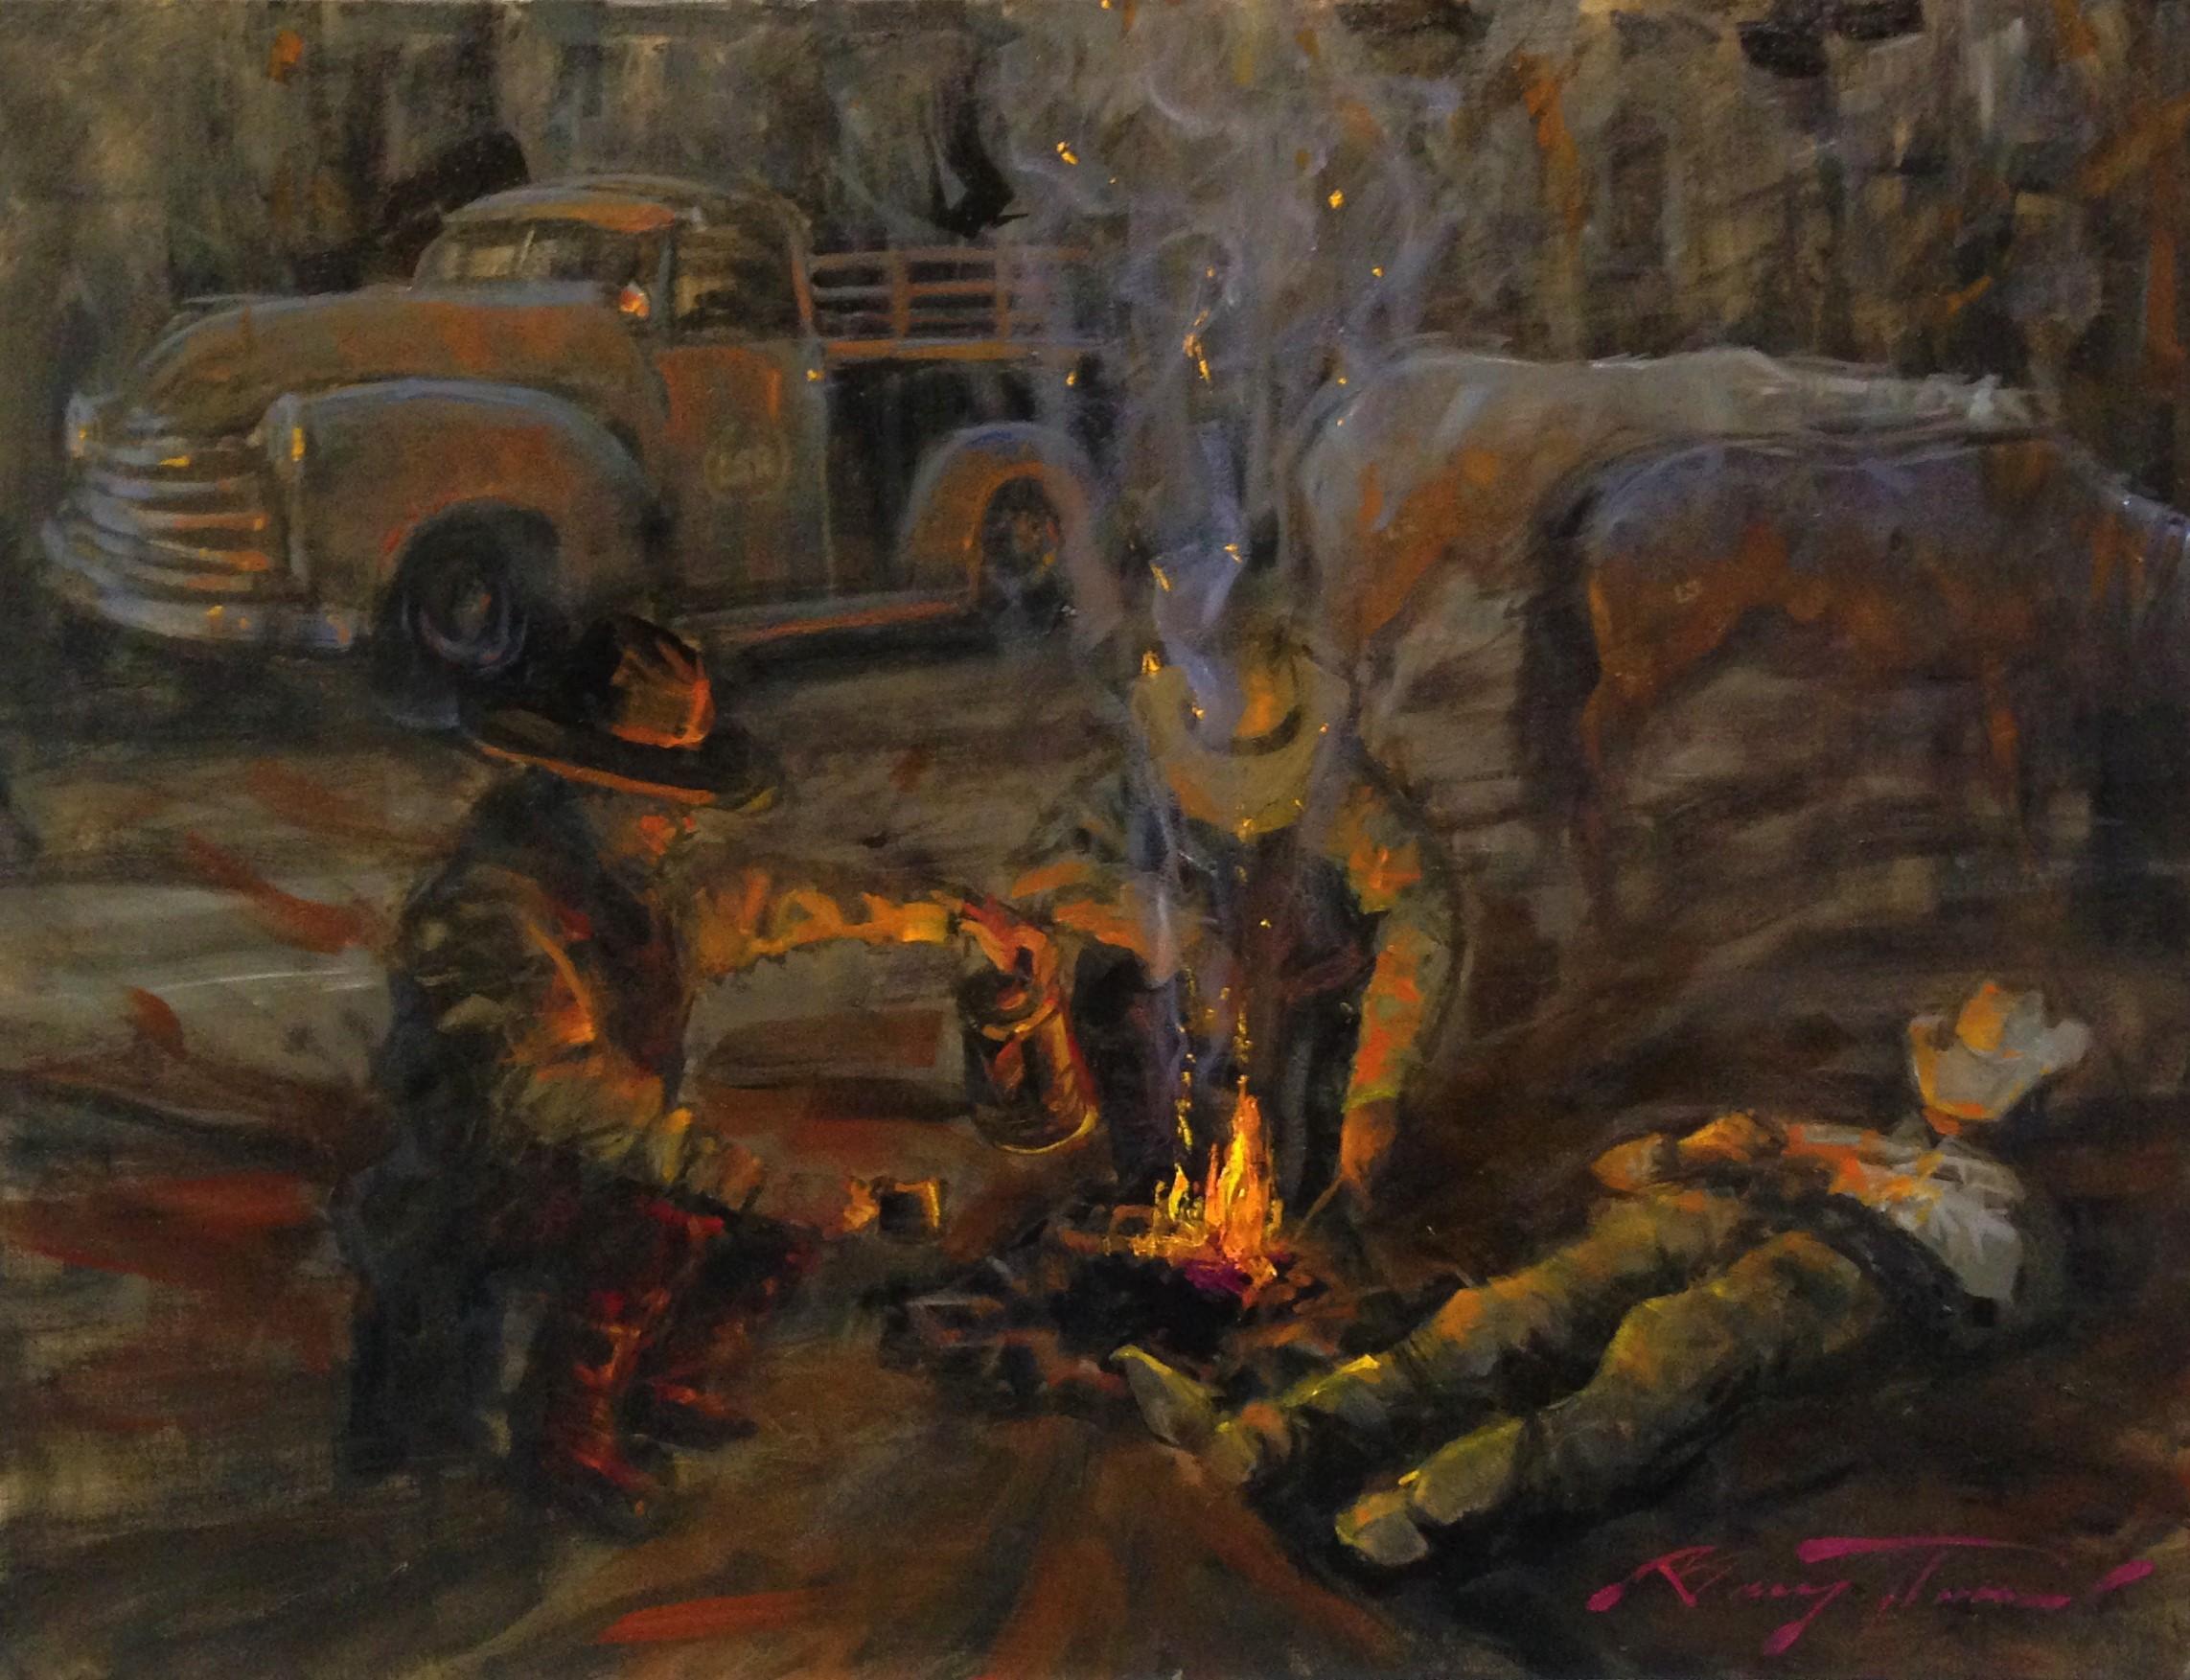 Cowboy's Camp